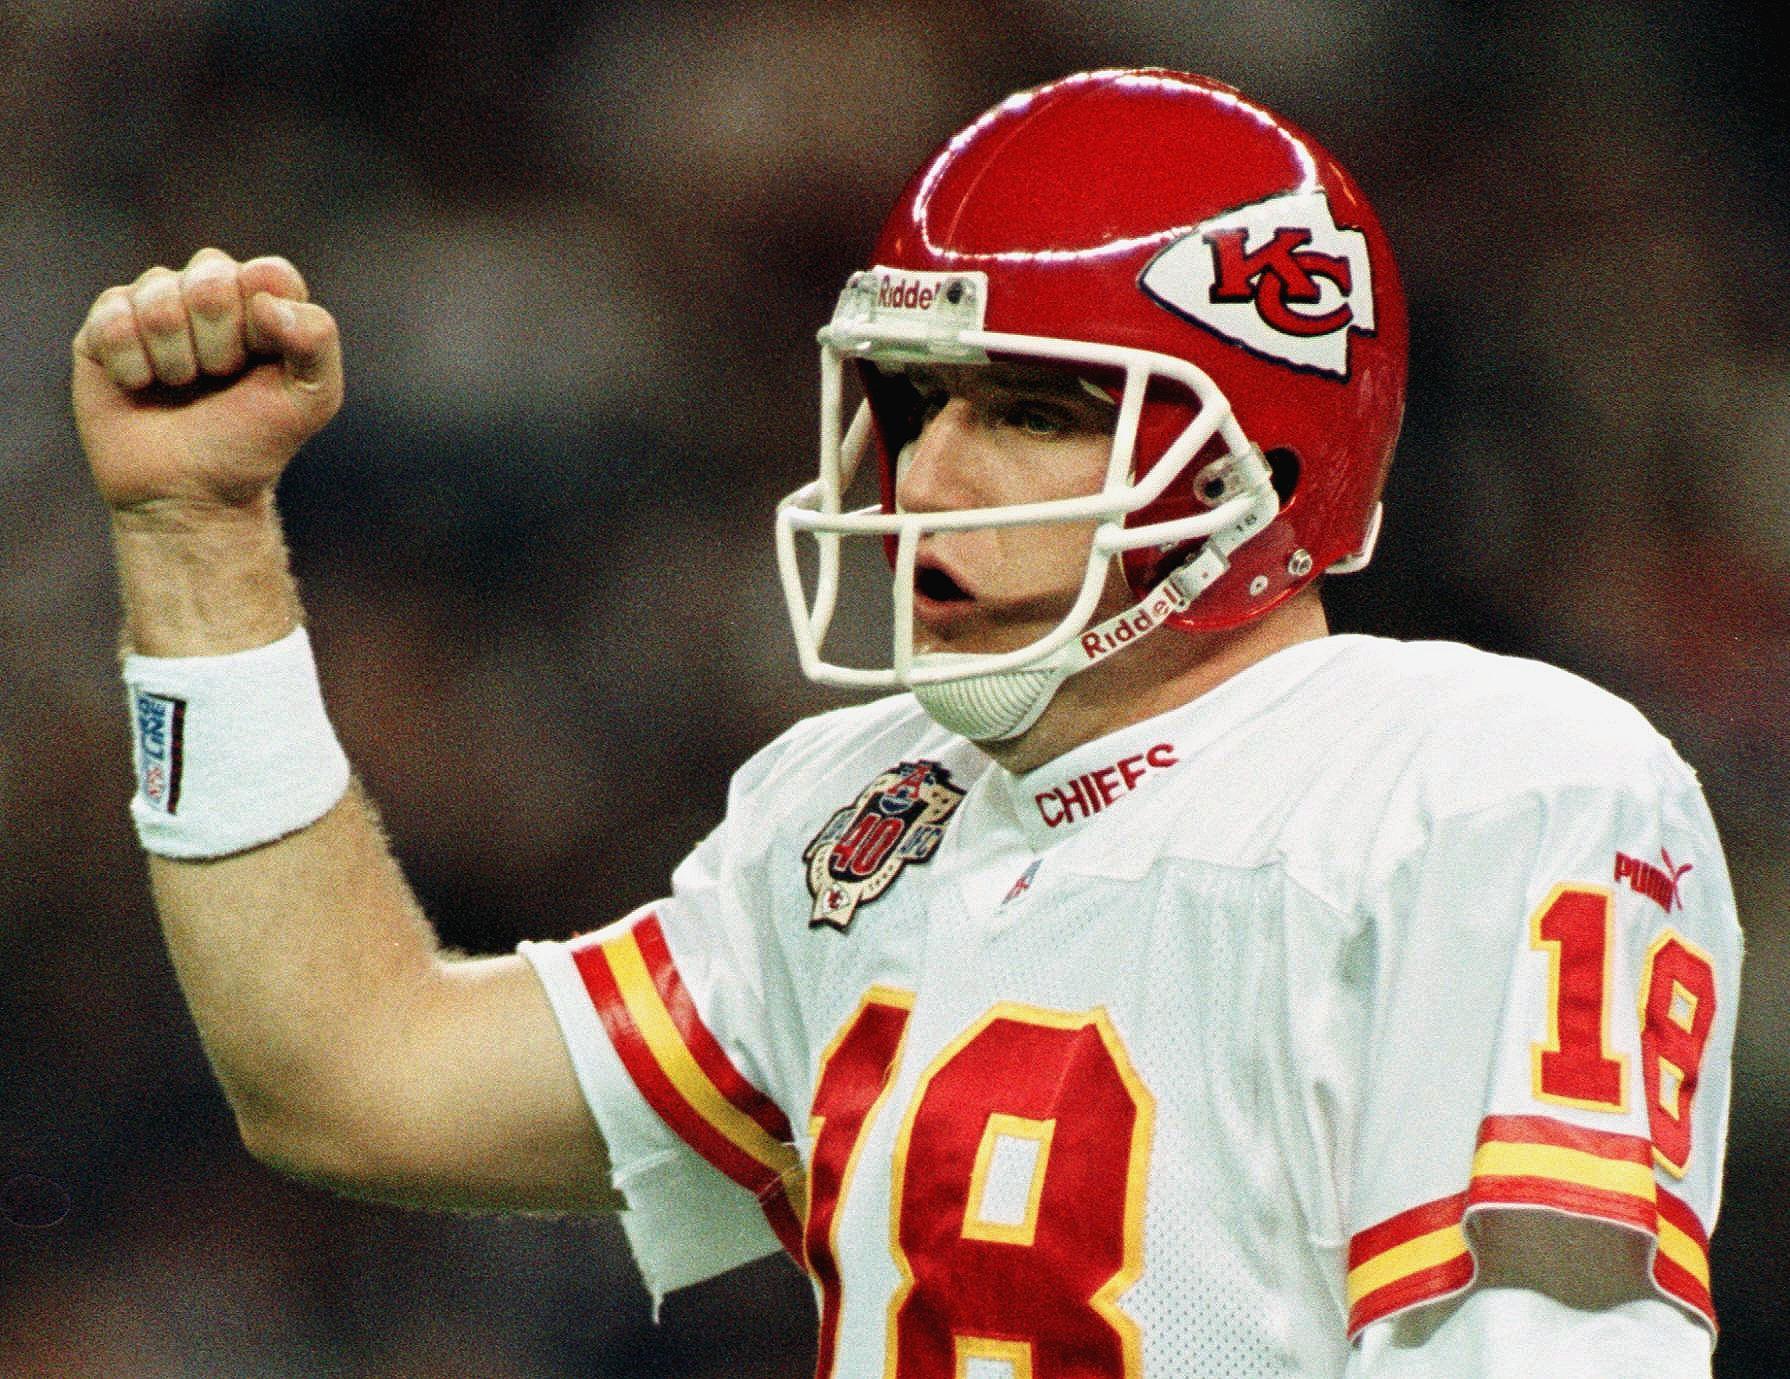 Kansas City Chief quarterback Elvis Grbac celebrat